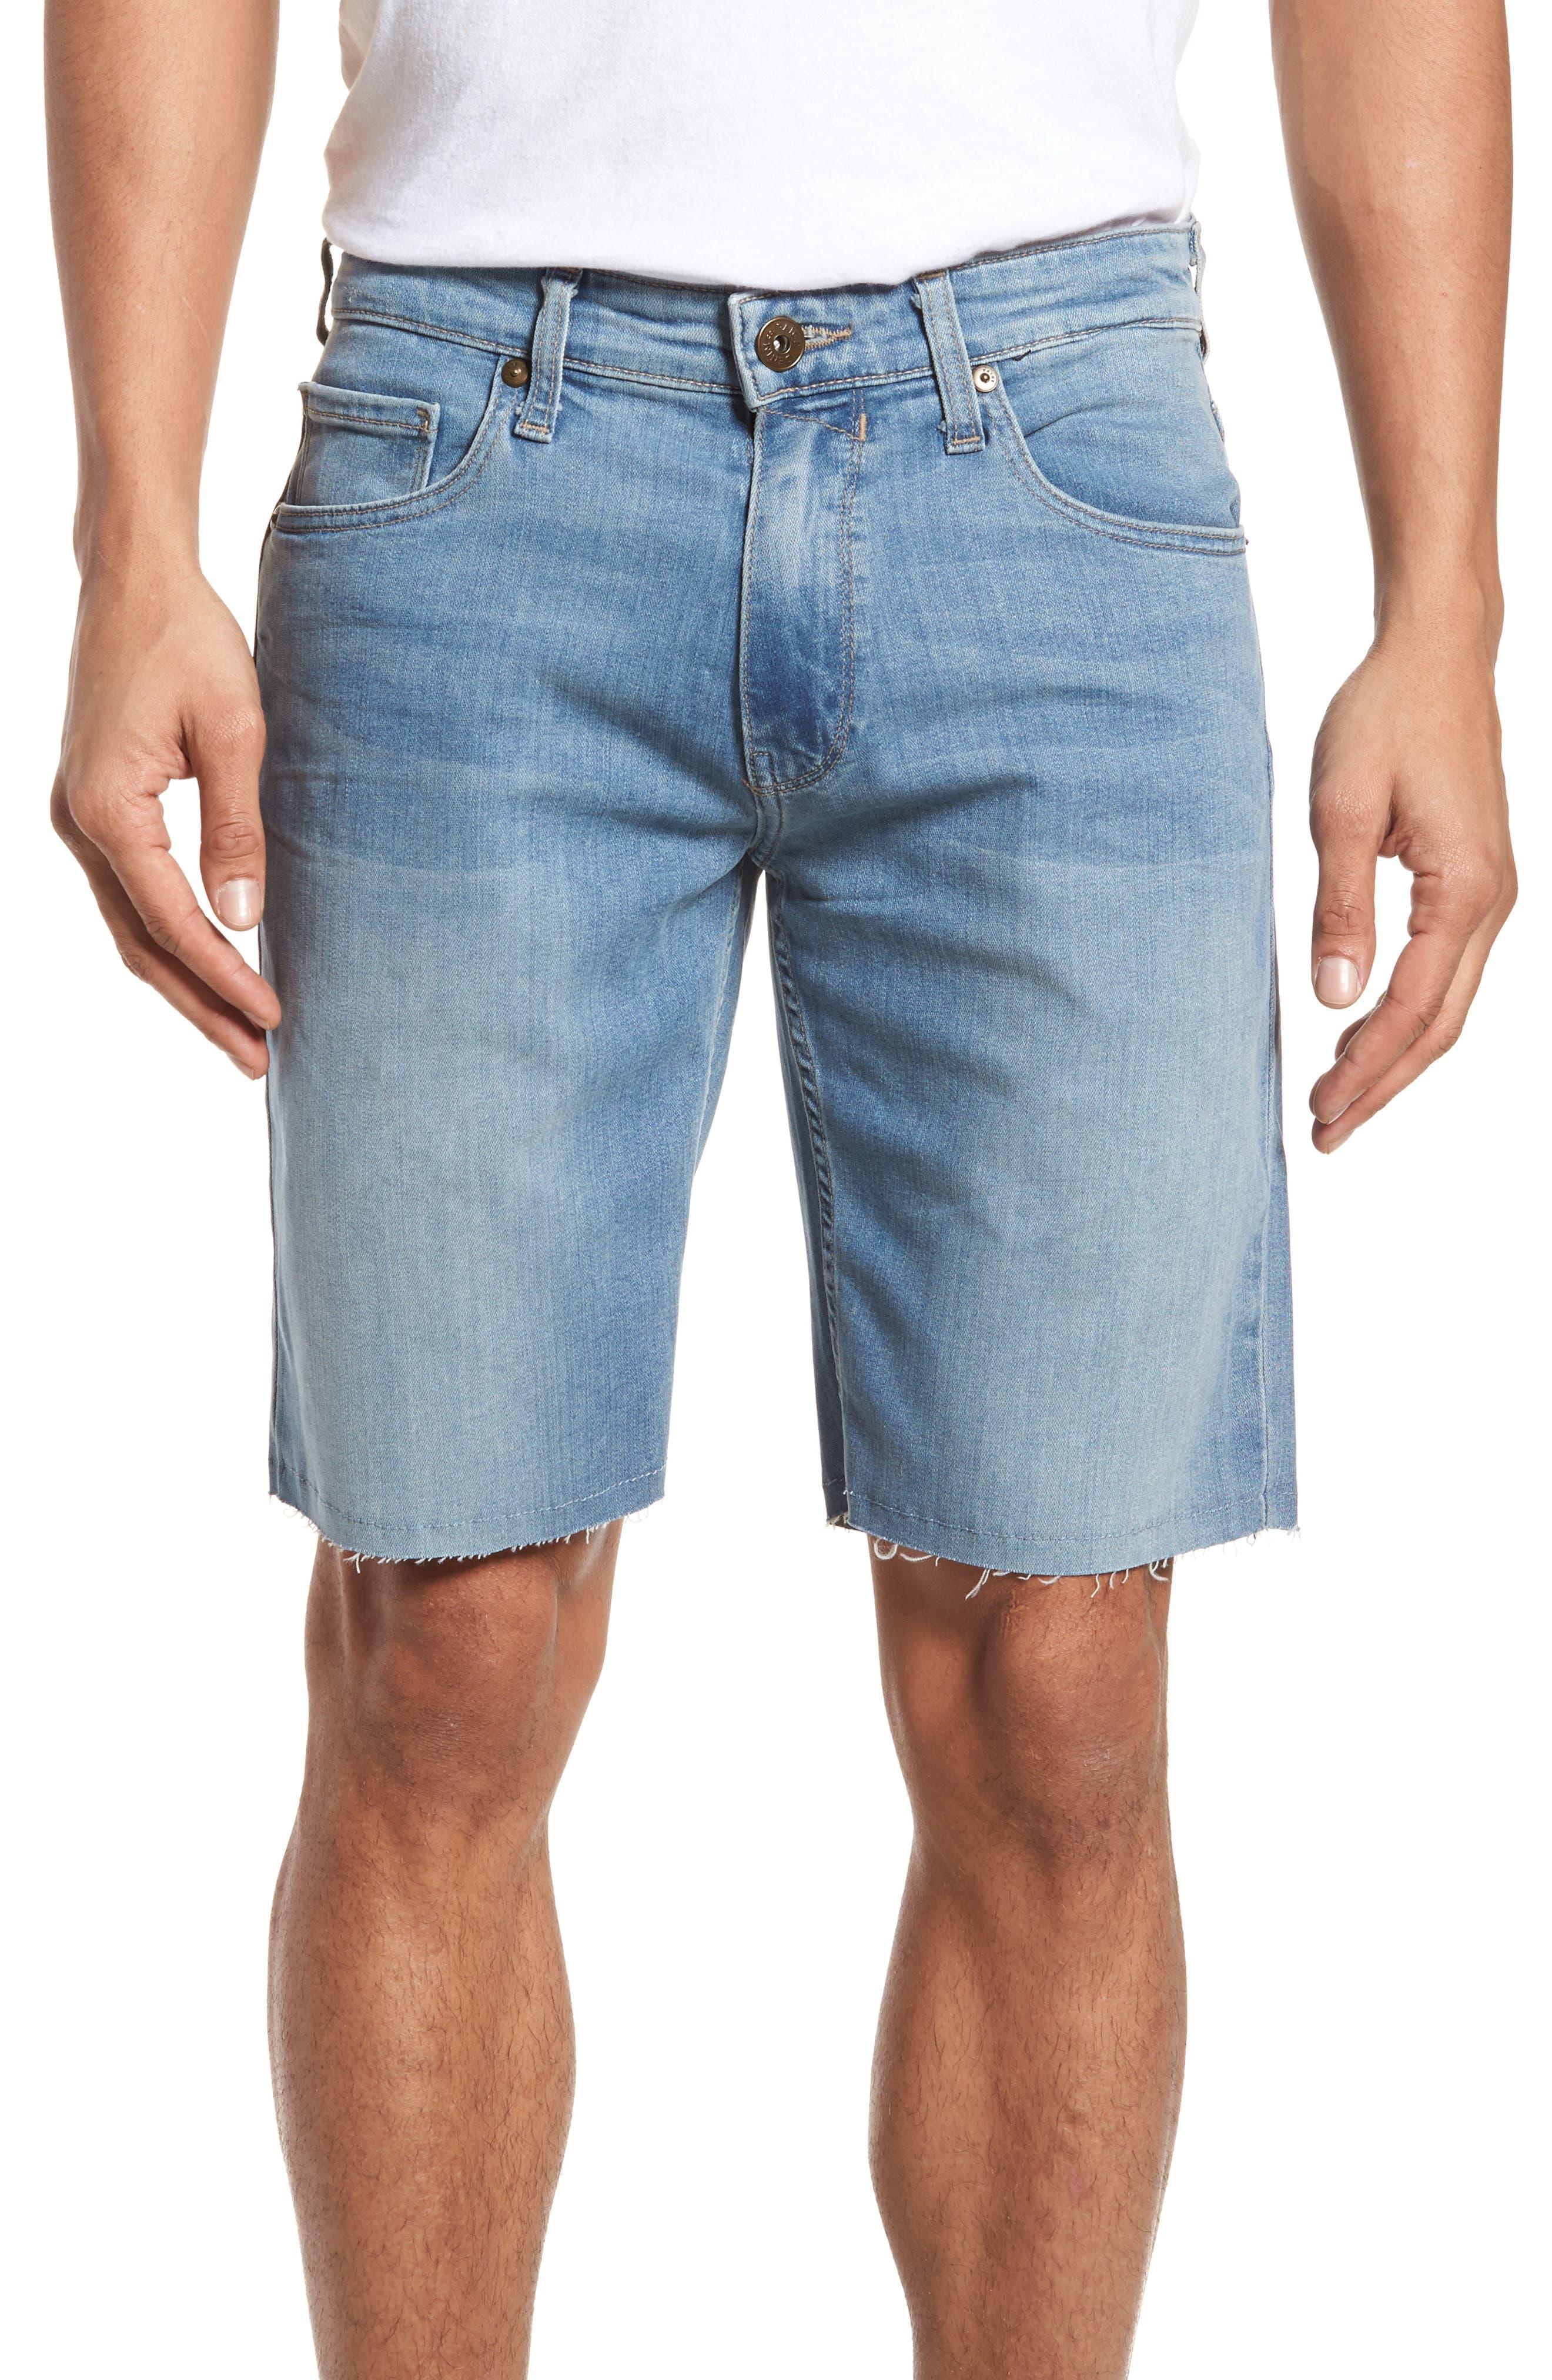 Transcend - Federal Slim Straight Leg Denim Shorts,                         Main,                         color, Roller